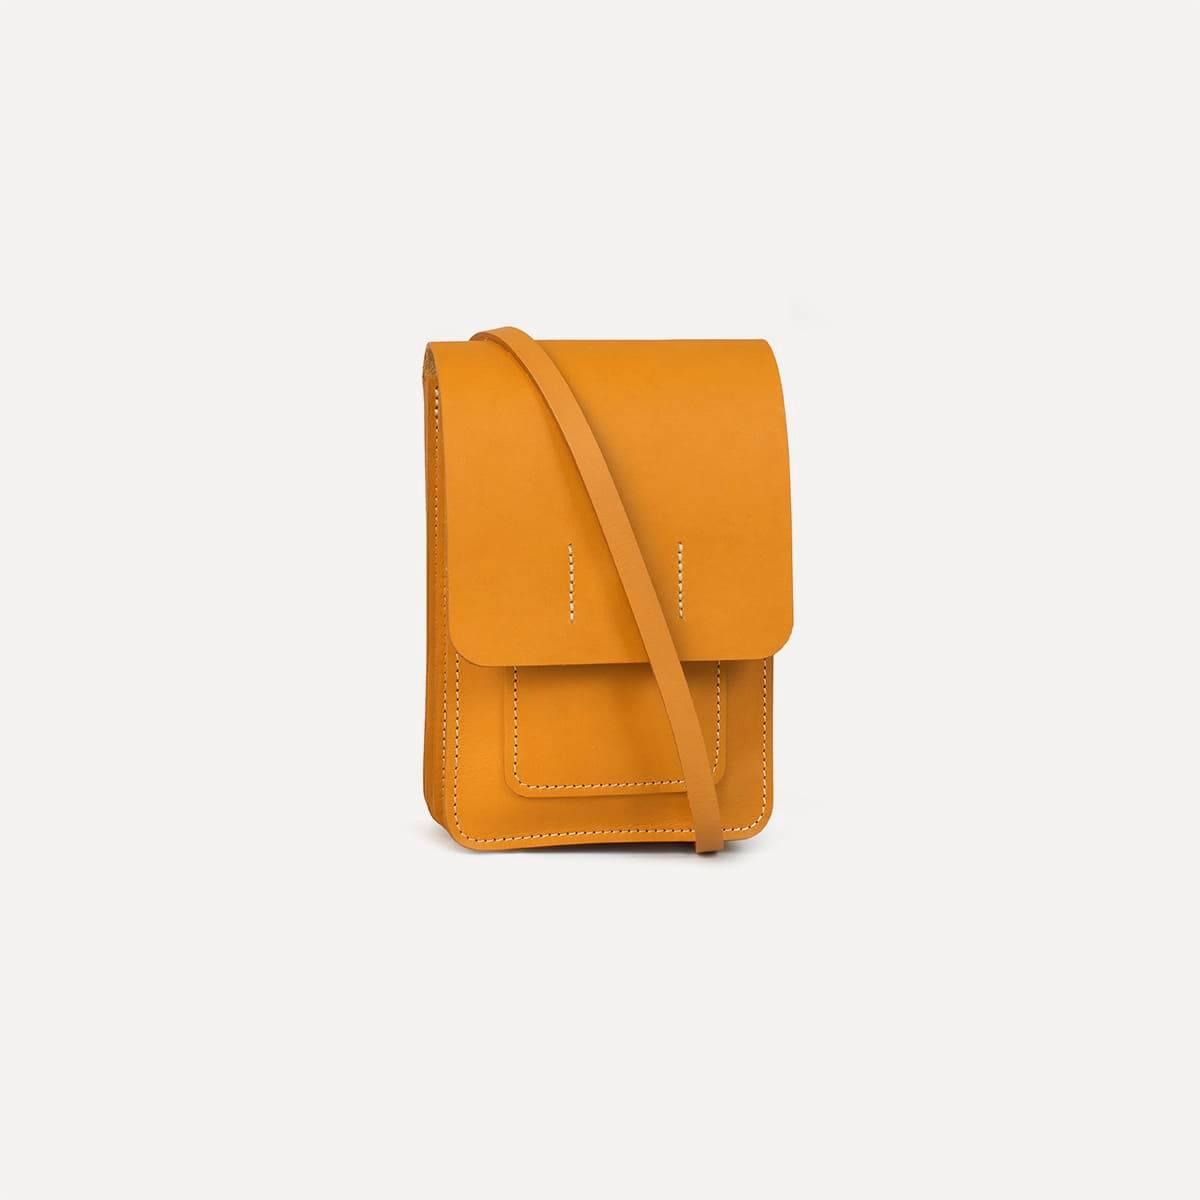 Jeweler's bag - BDC x Atelier Paulin (image n°4)